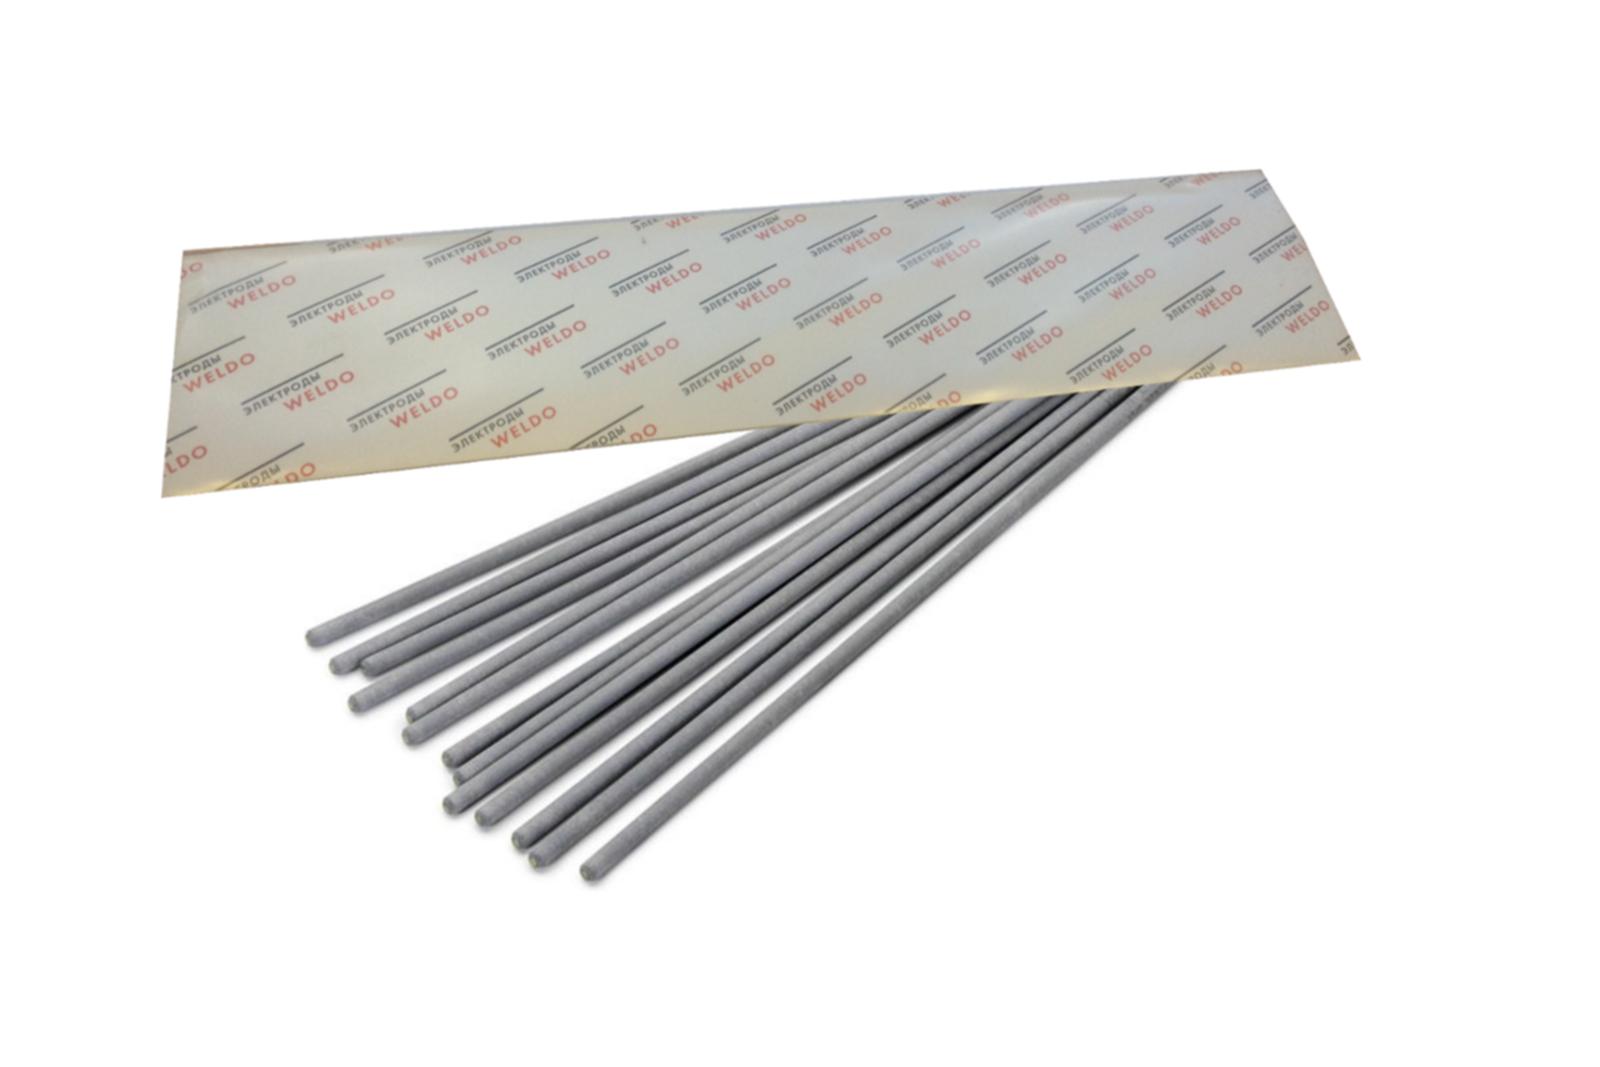 Электроды для сварки Weldo R-143 Ф2.0мм электроды для сварки wester ано 4 3 0мм 1кг